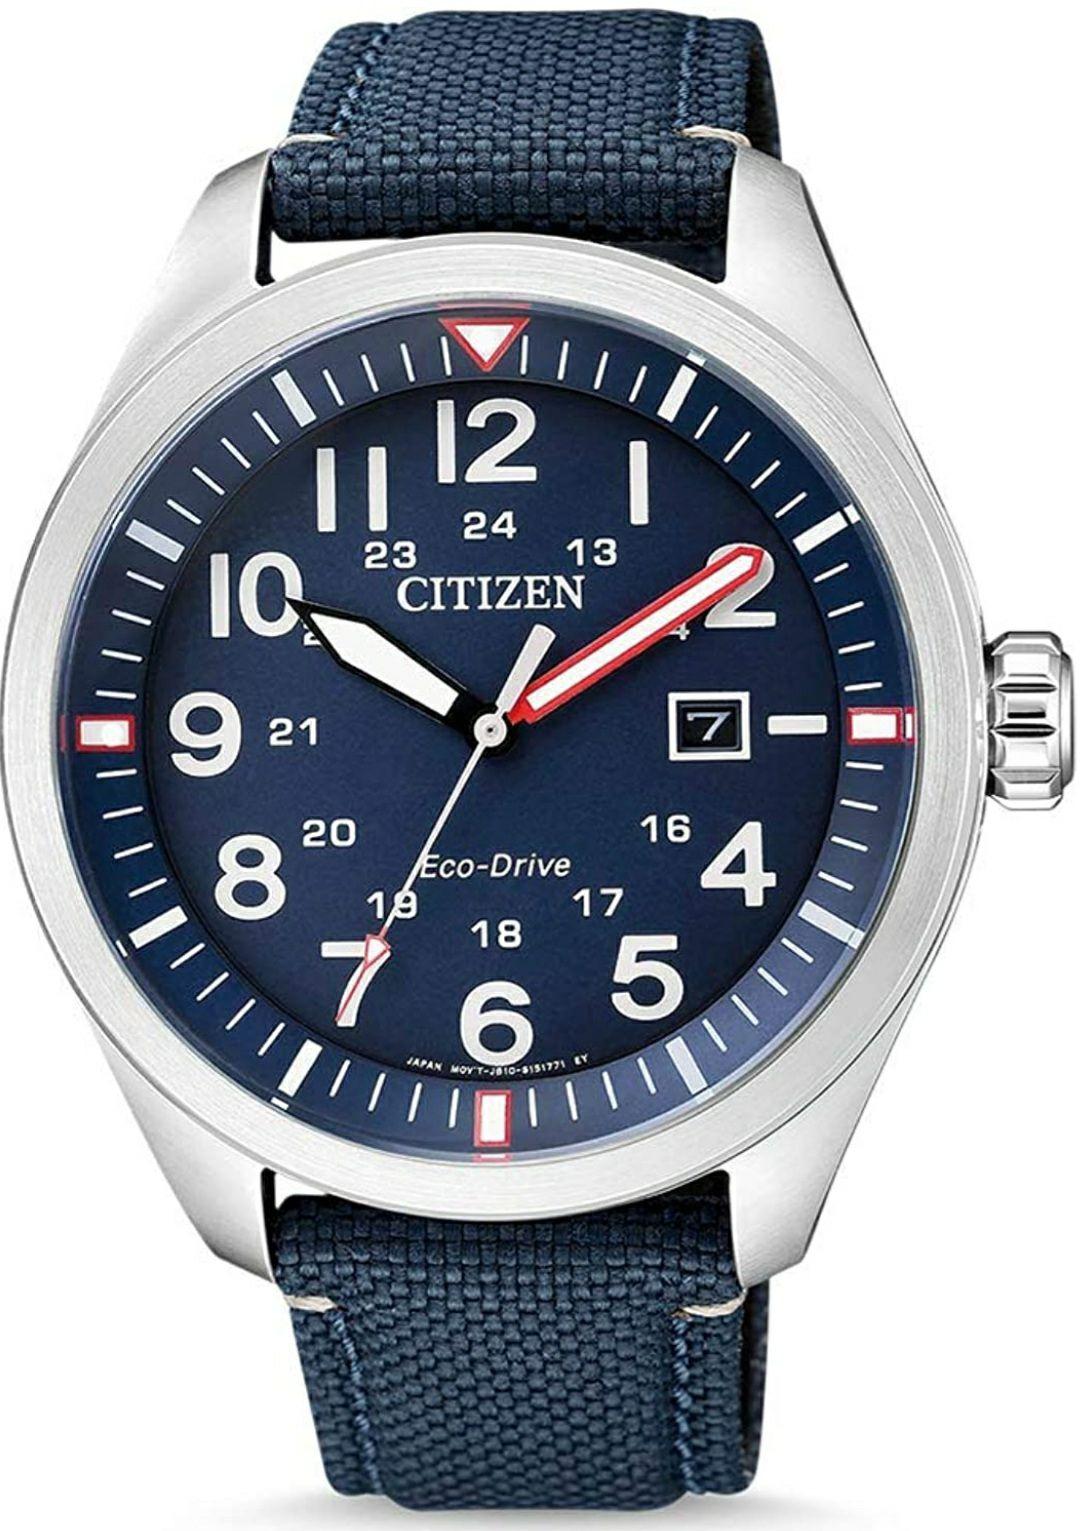 Citizen Eco-Drive AW5000-16L